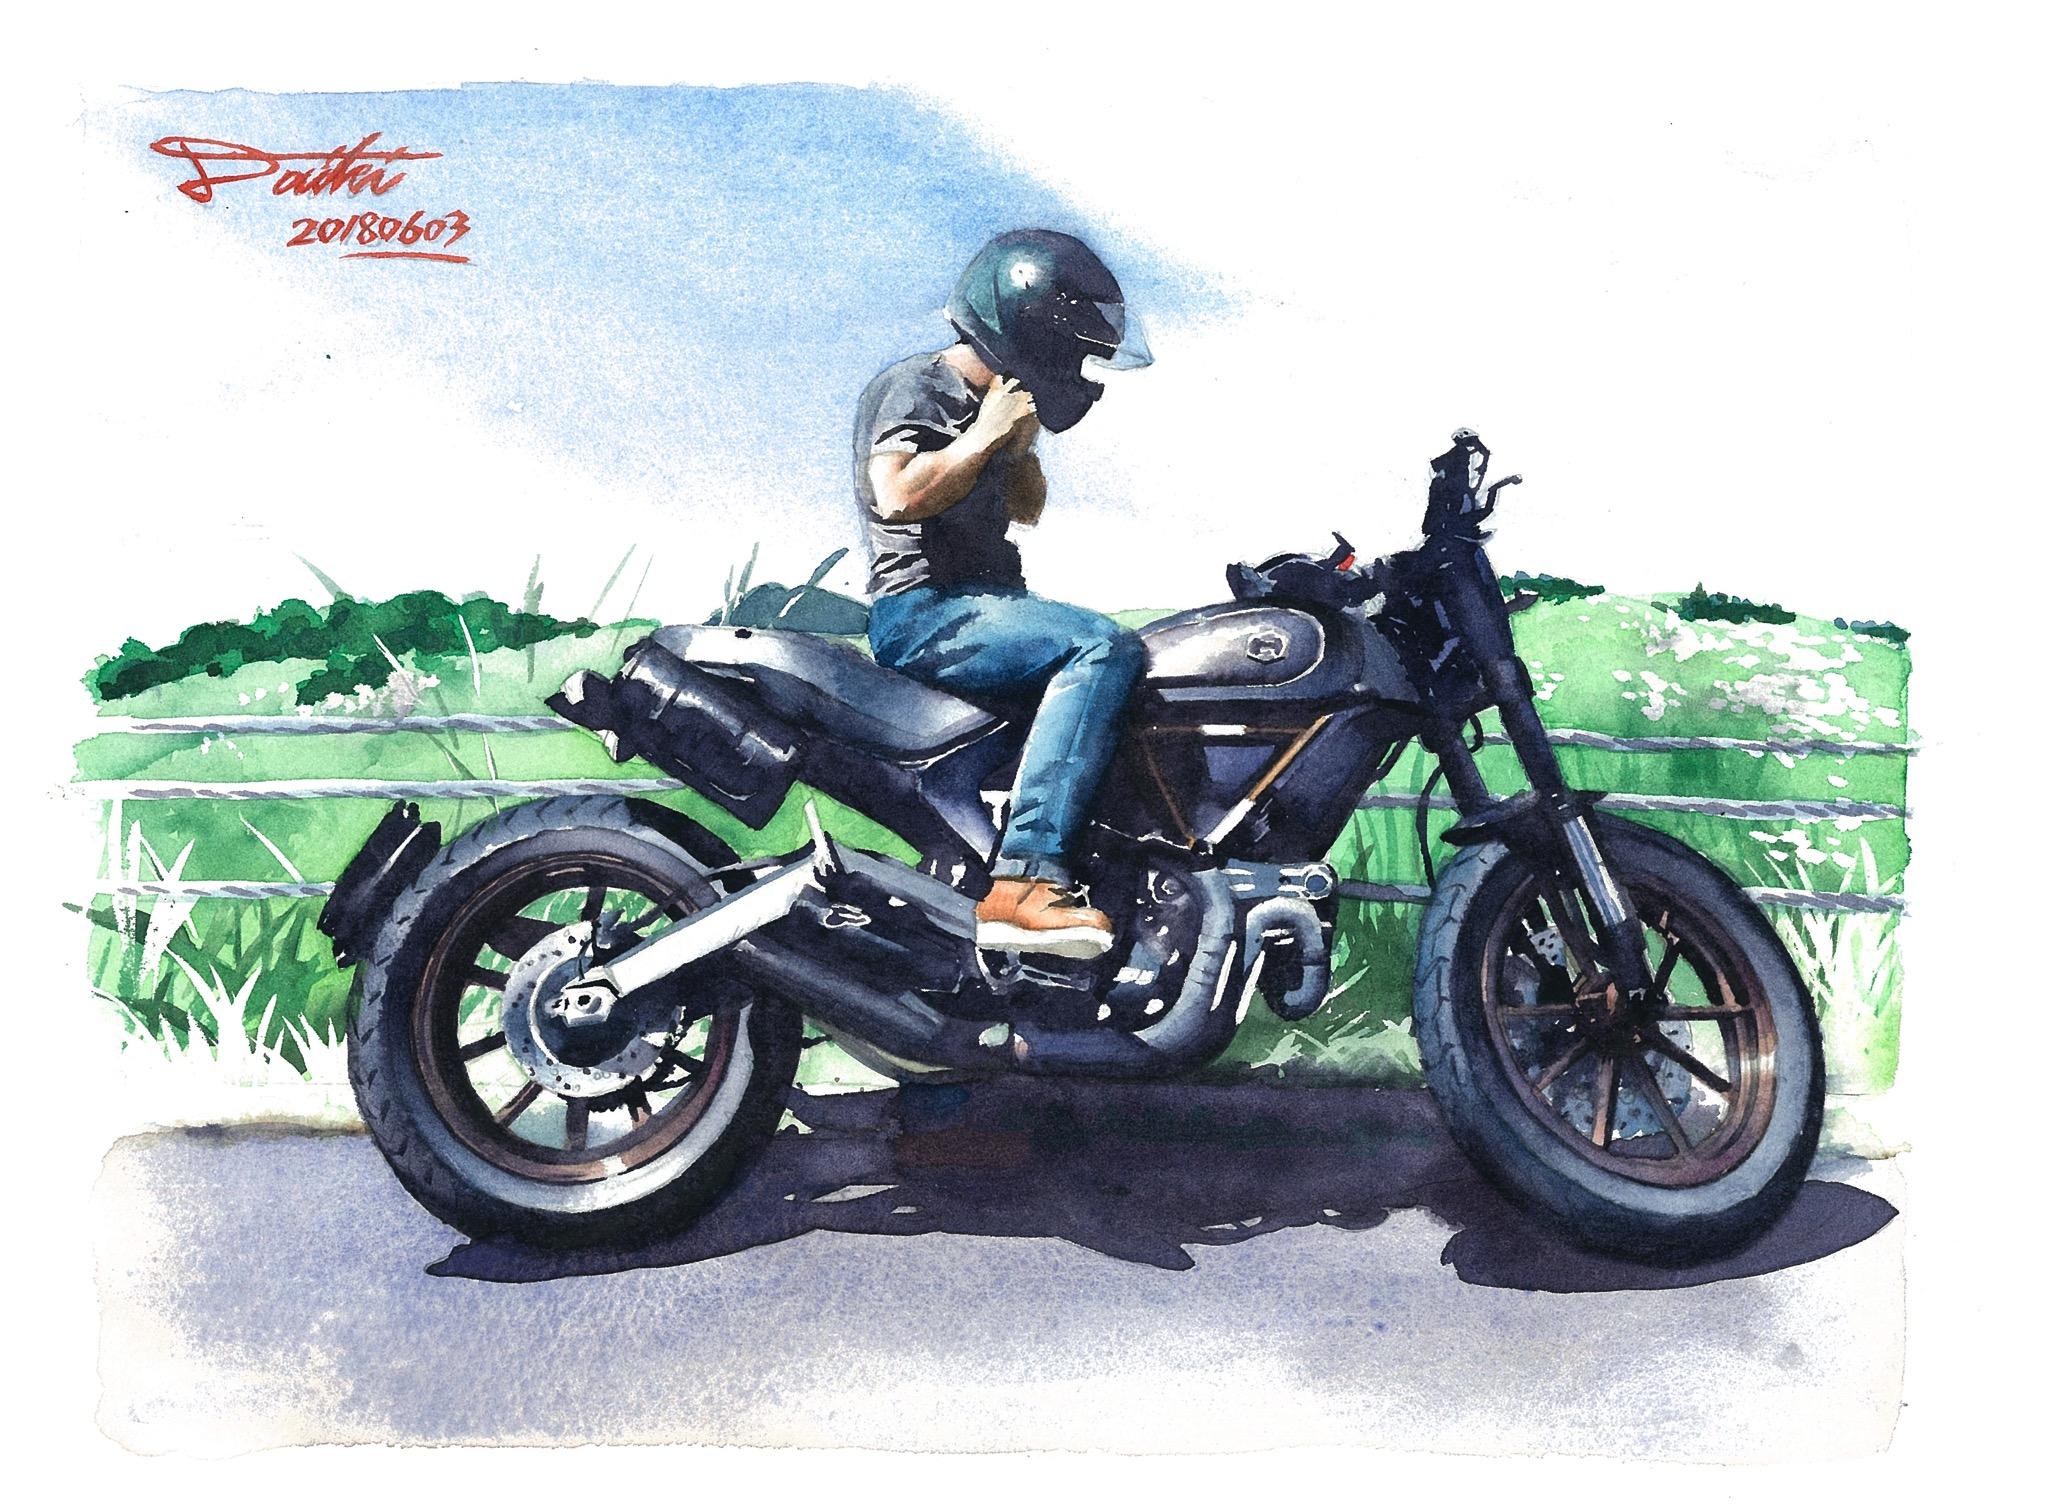 DUCATI scrambler1100 水彩バイクイラスト